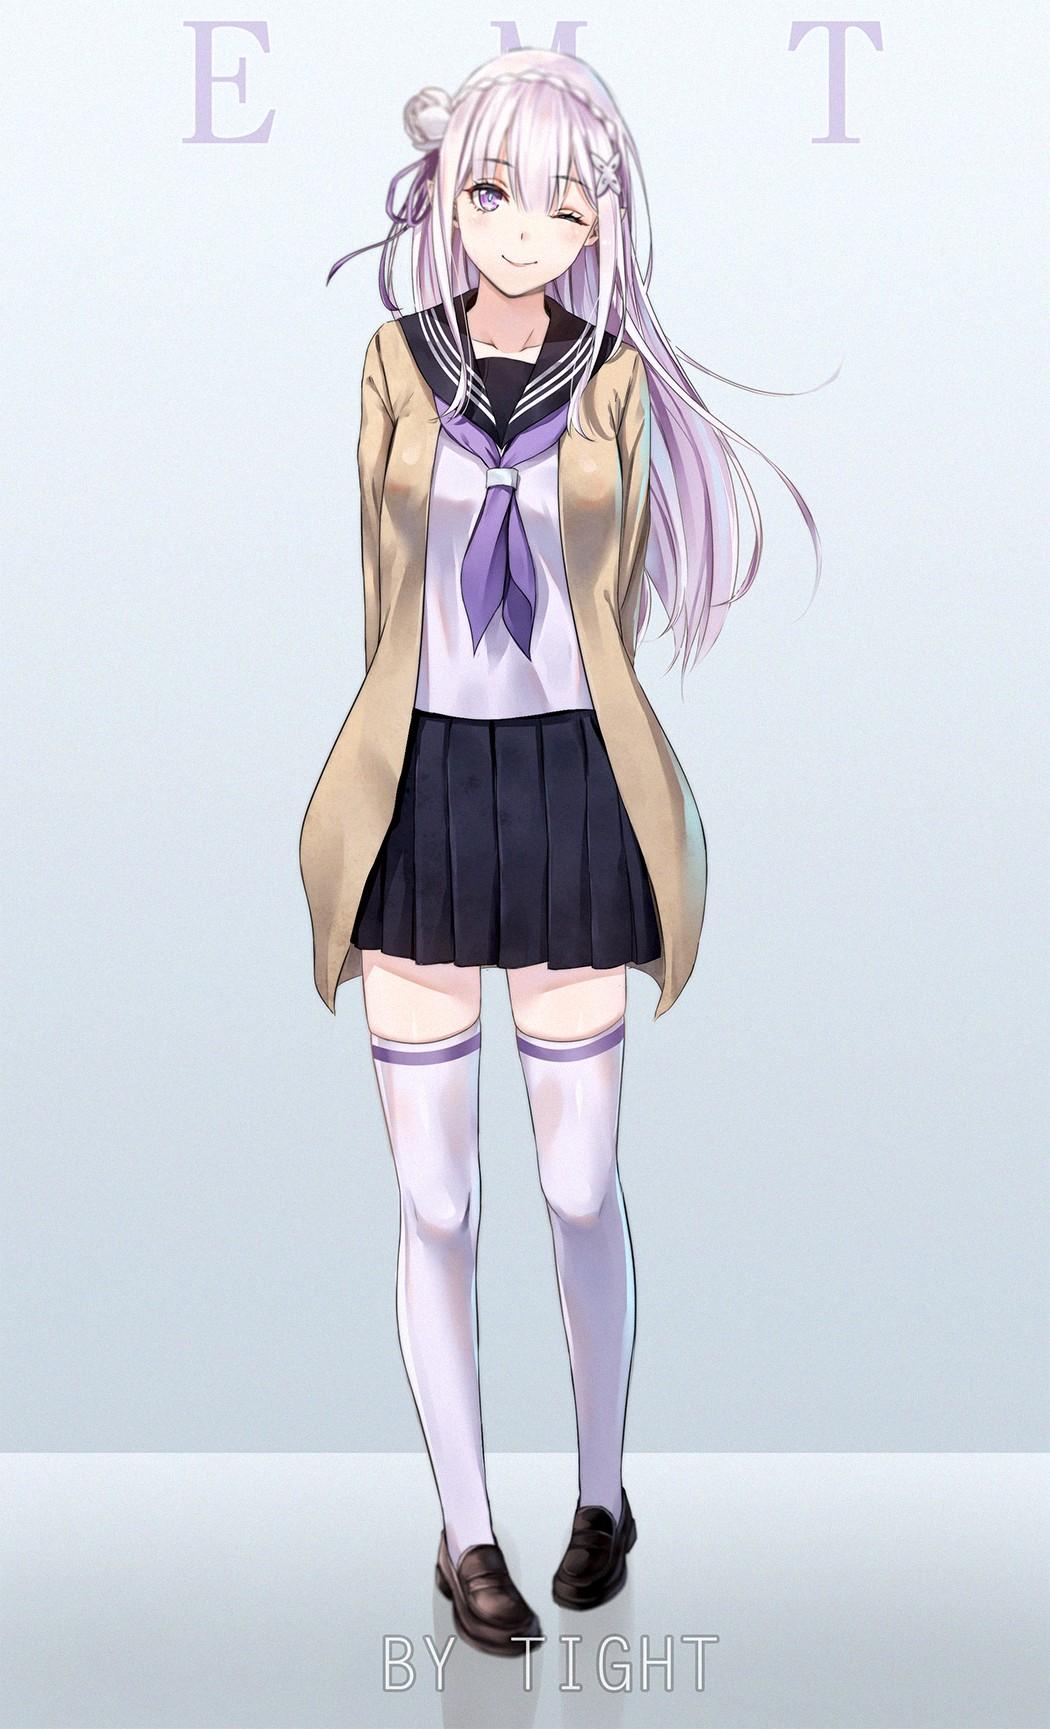 Anime 1050x1729 Re:Zero Kara Hajimeru Isekai Seikatsu anime girls Emilia (Re: Zero) Felt (Re:Zero)